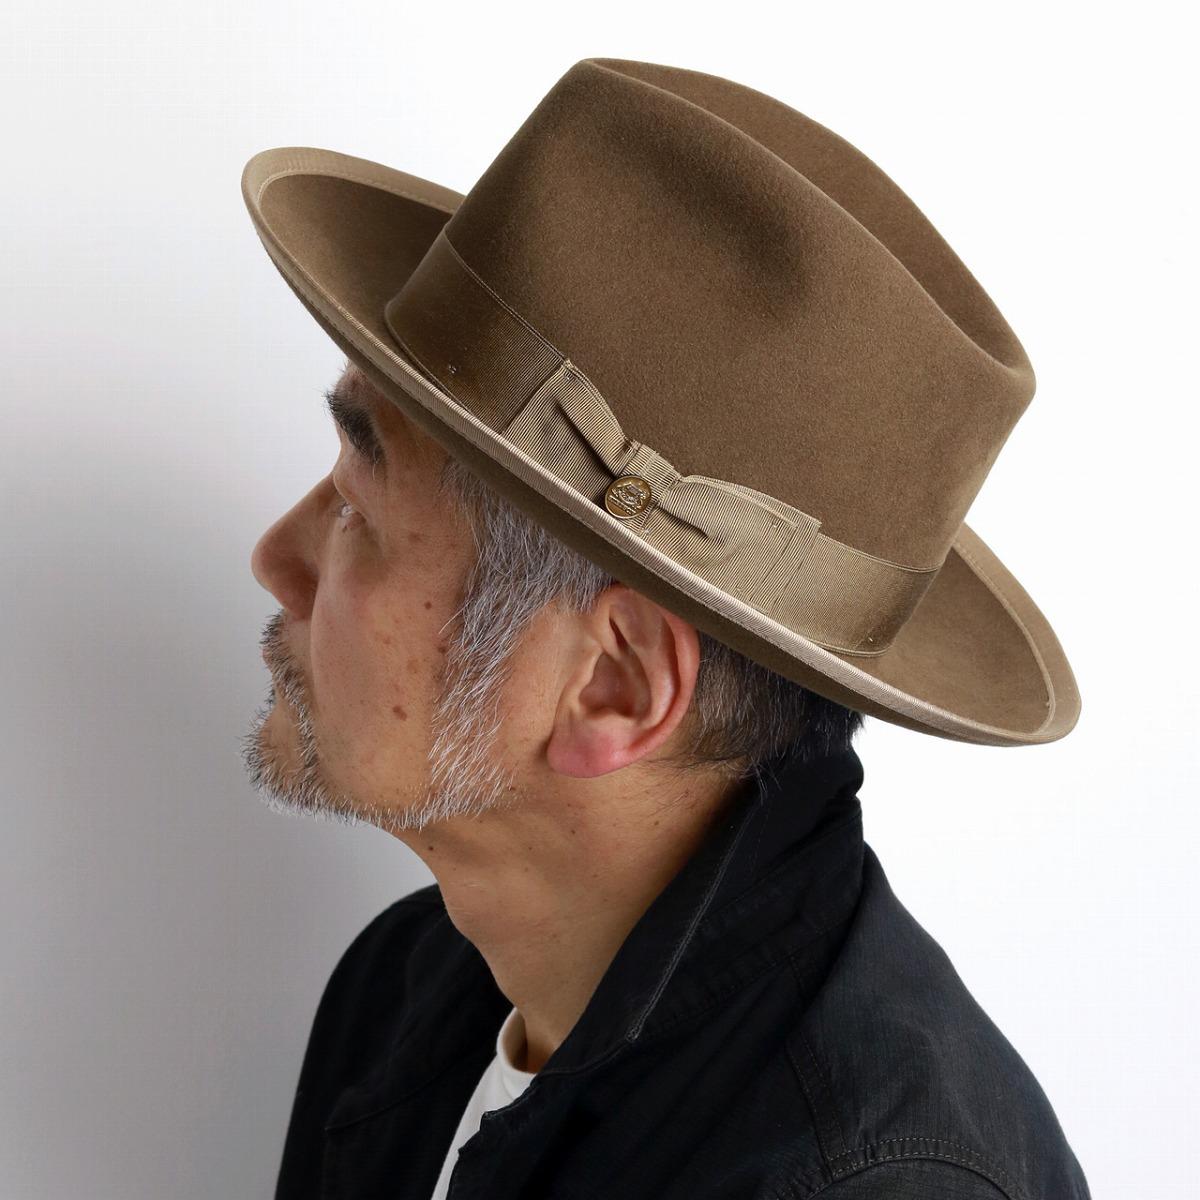 Stetson felt hat men soft felt hat hat vintage we pet soft felt hat  gentleman high ... 8f8e9b46fd9